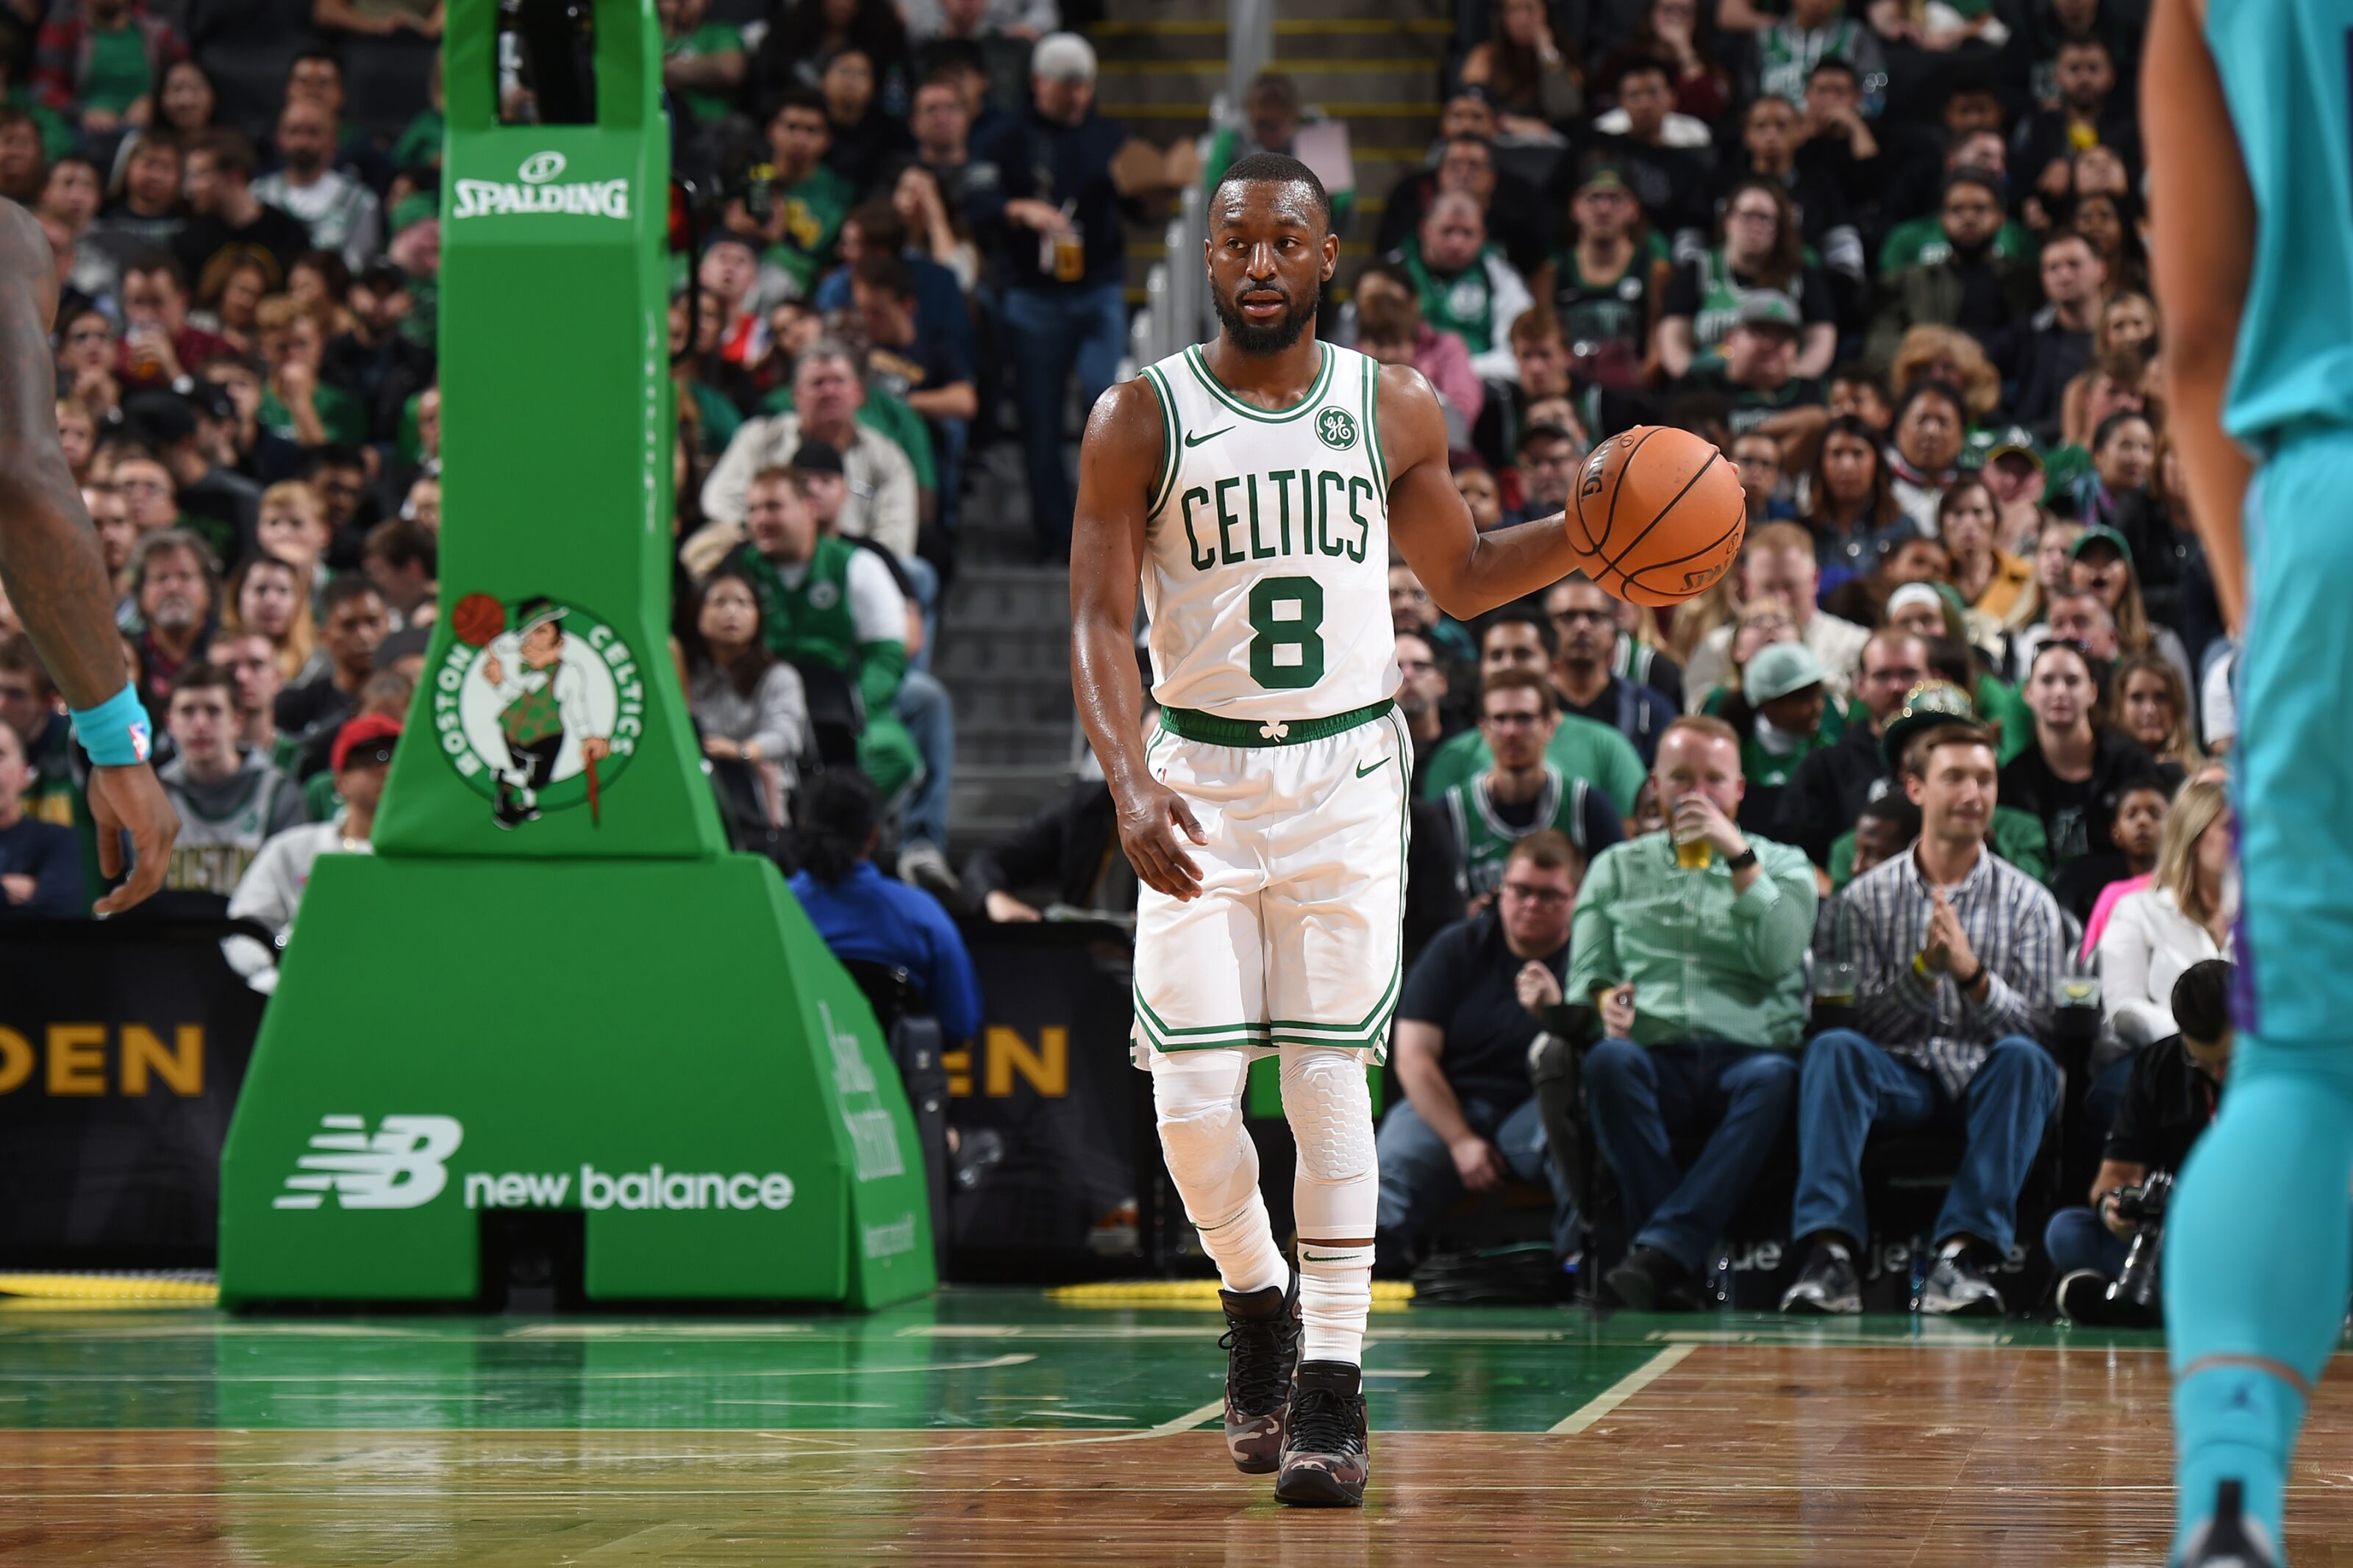 Boston Celtics: 3 key reasons to target Kemba Walker in fantasy basketball